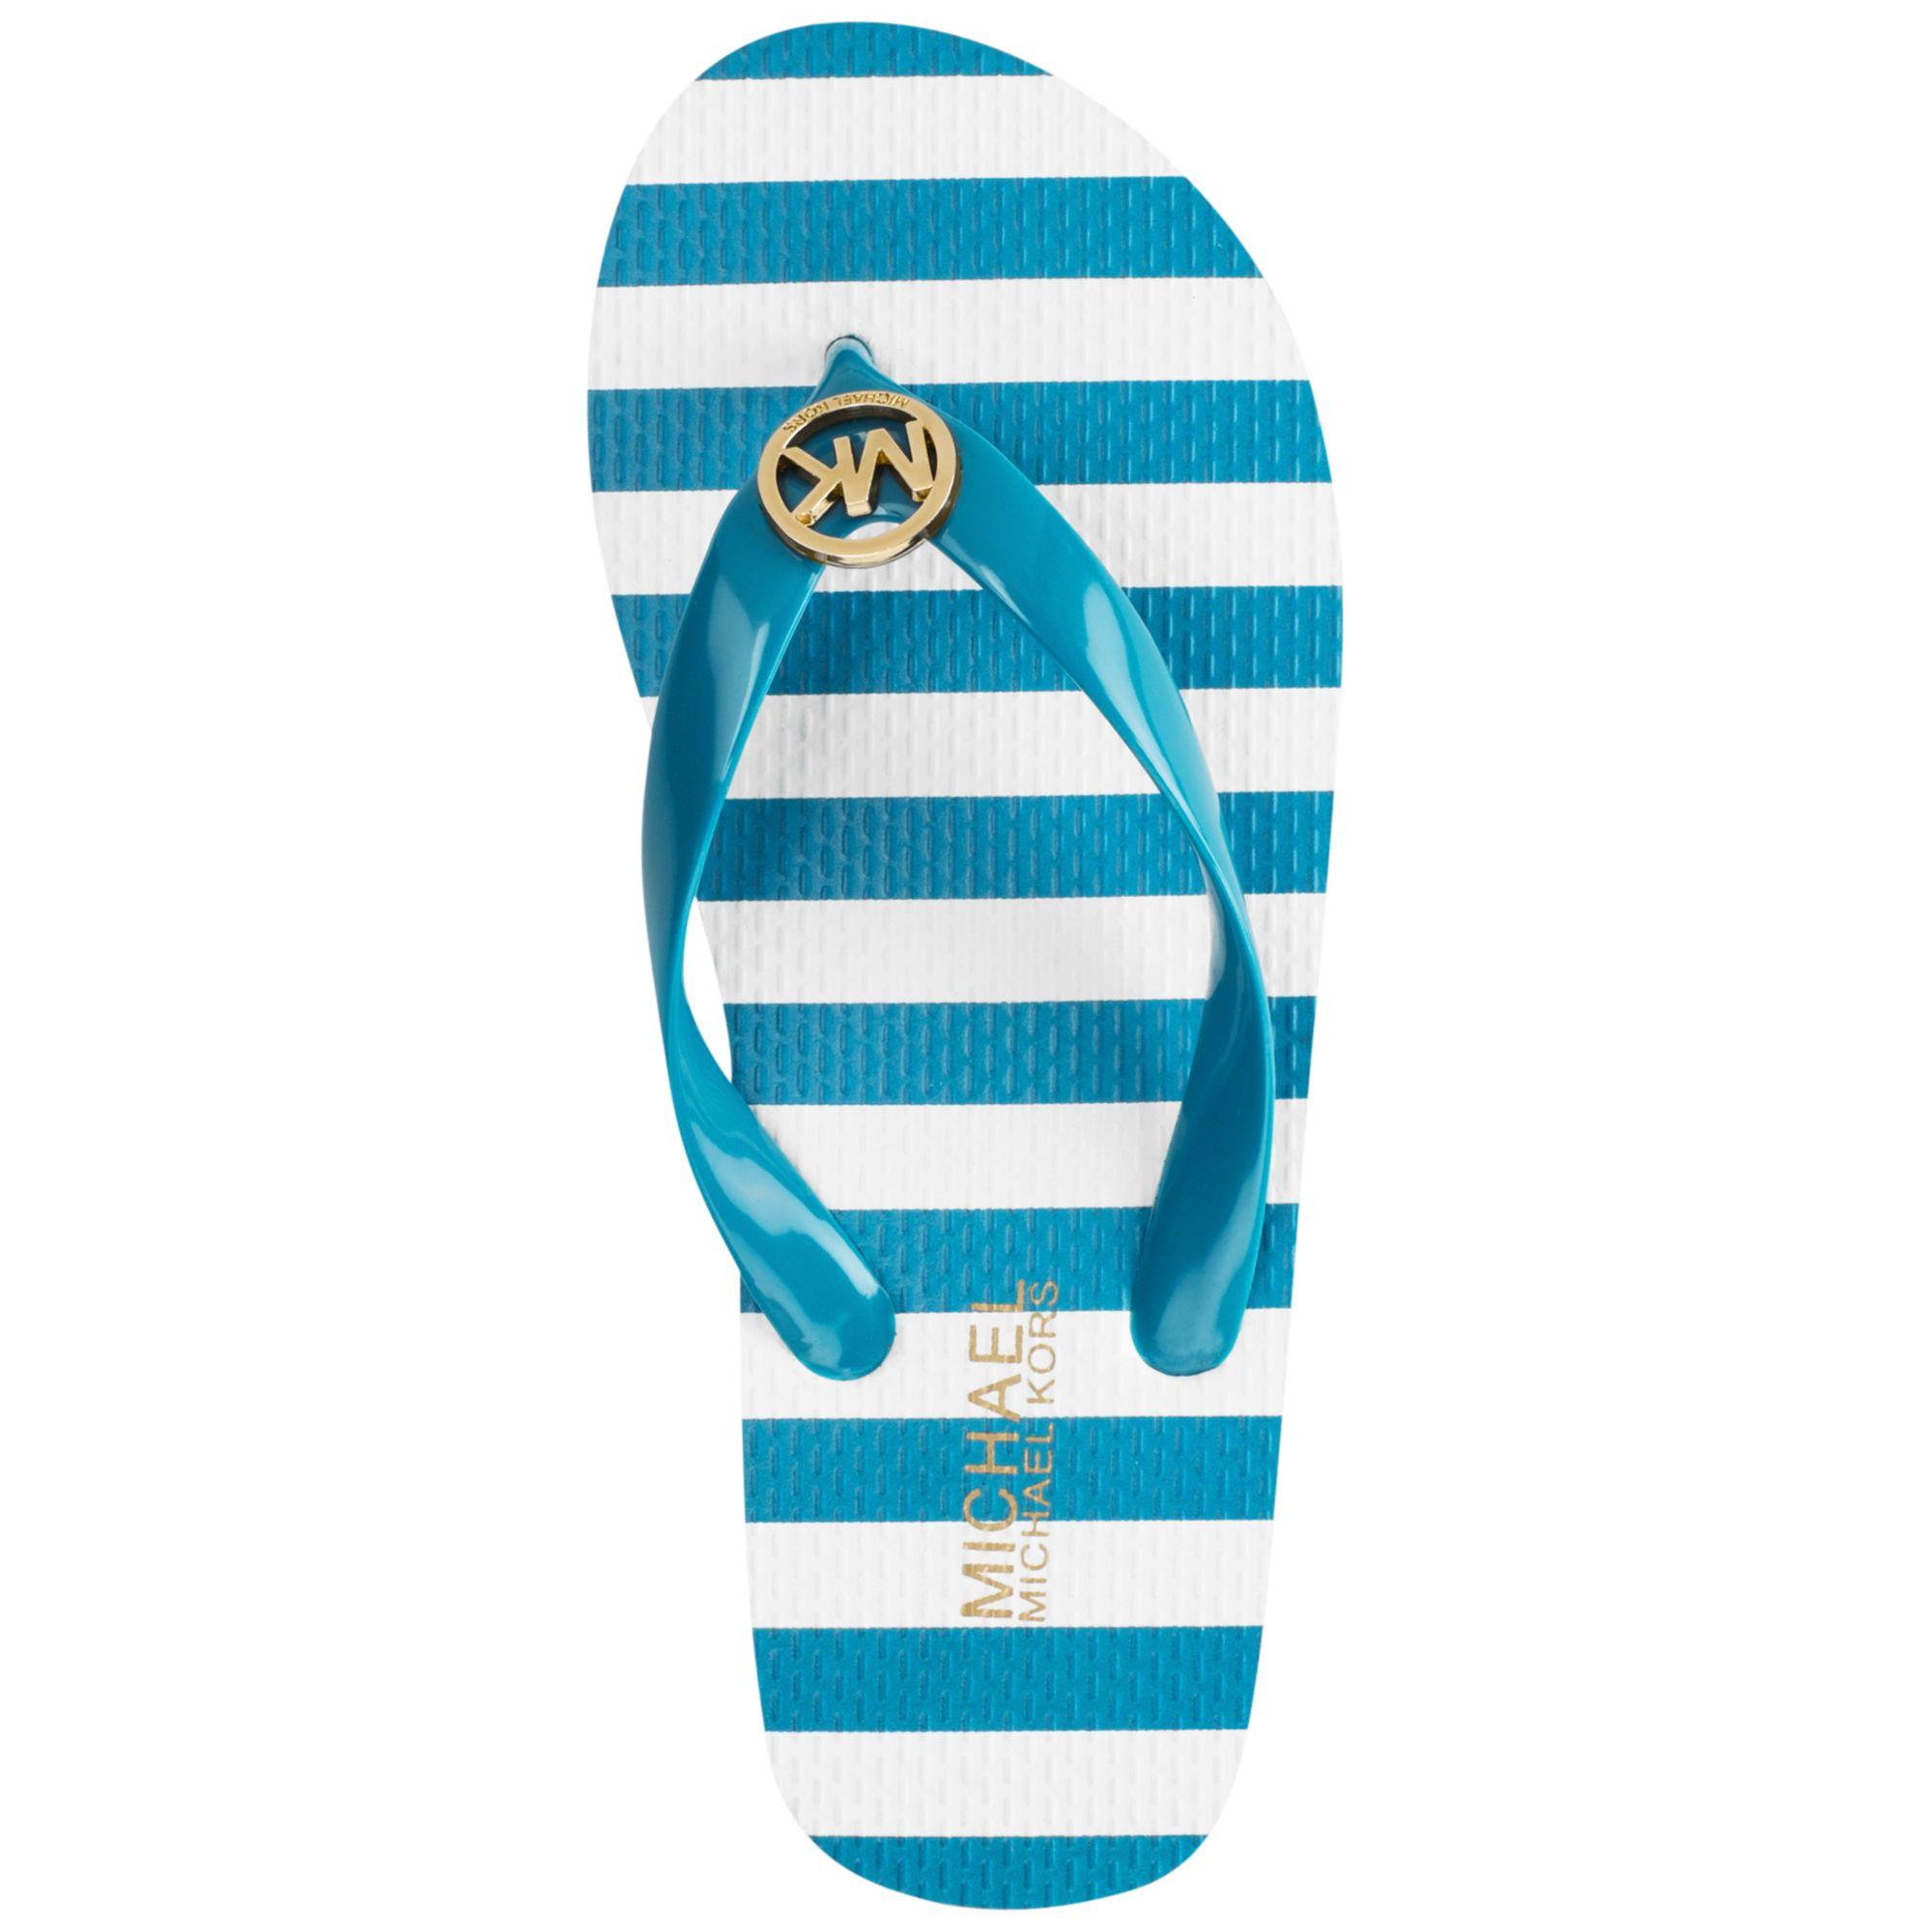 5a6316360888 Lyst - Michael Kors Michael Mk Flip Flops in Blue